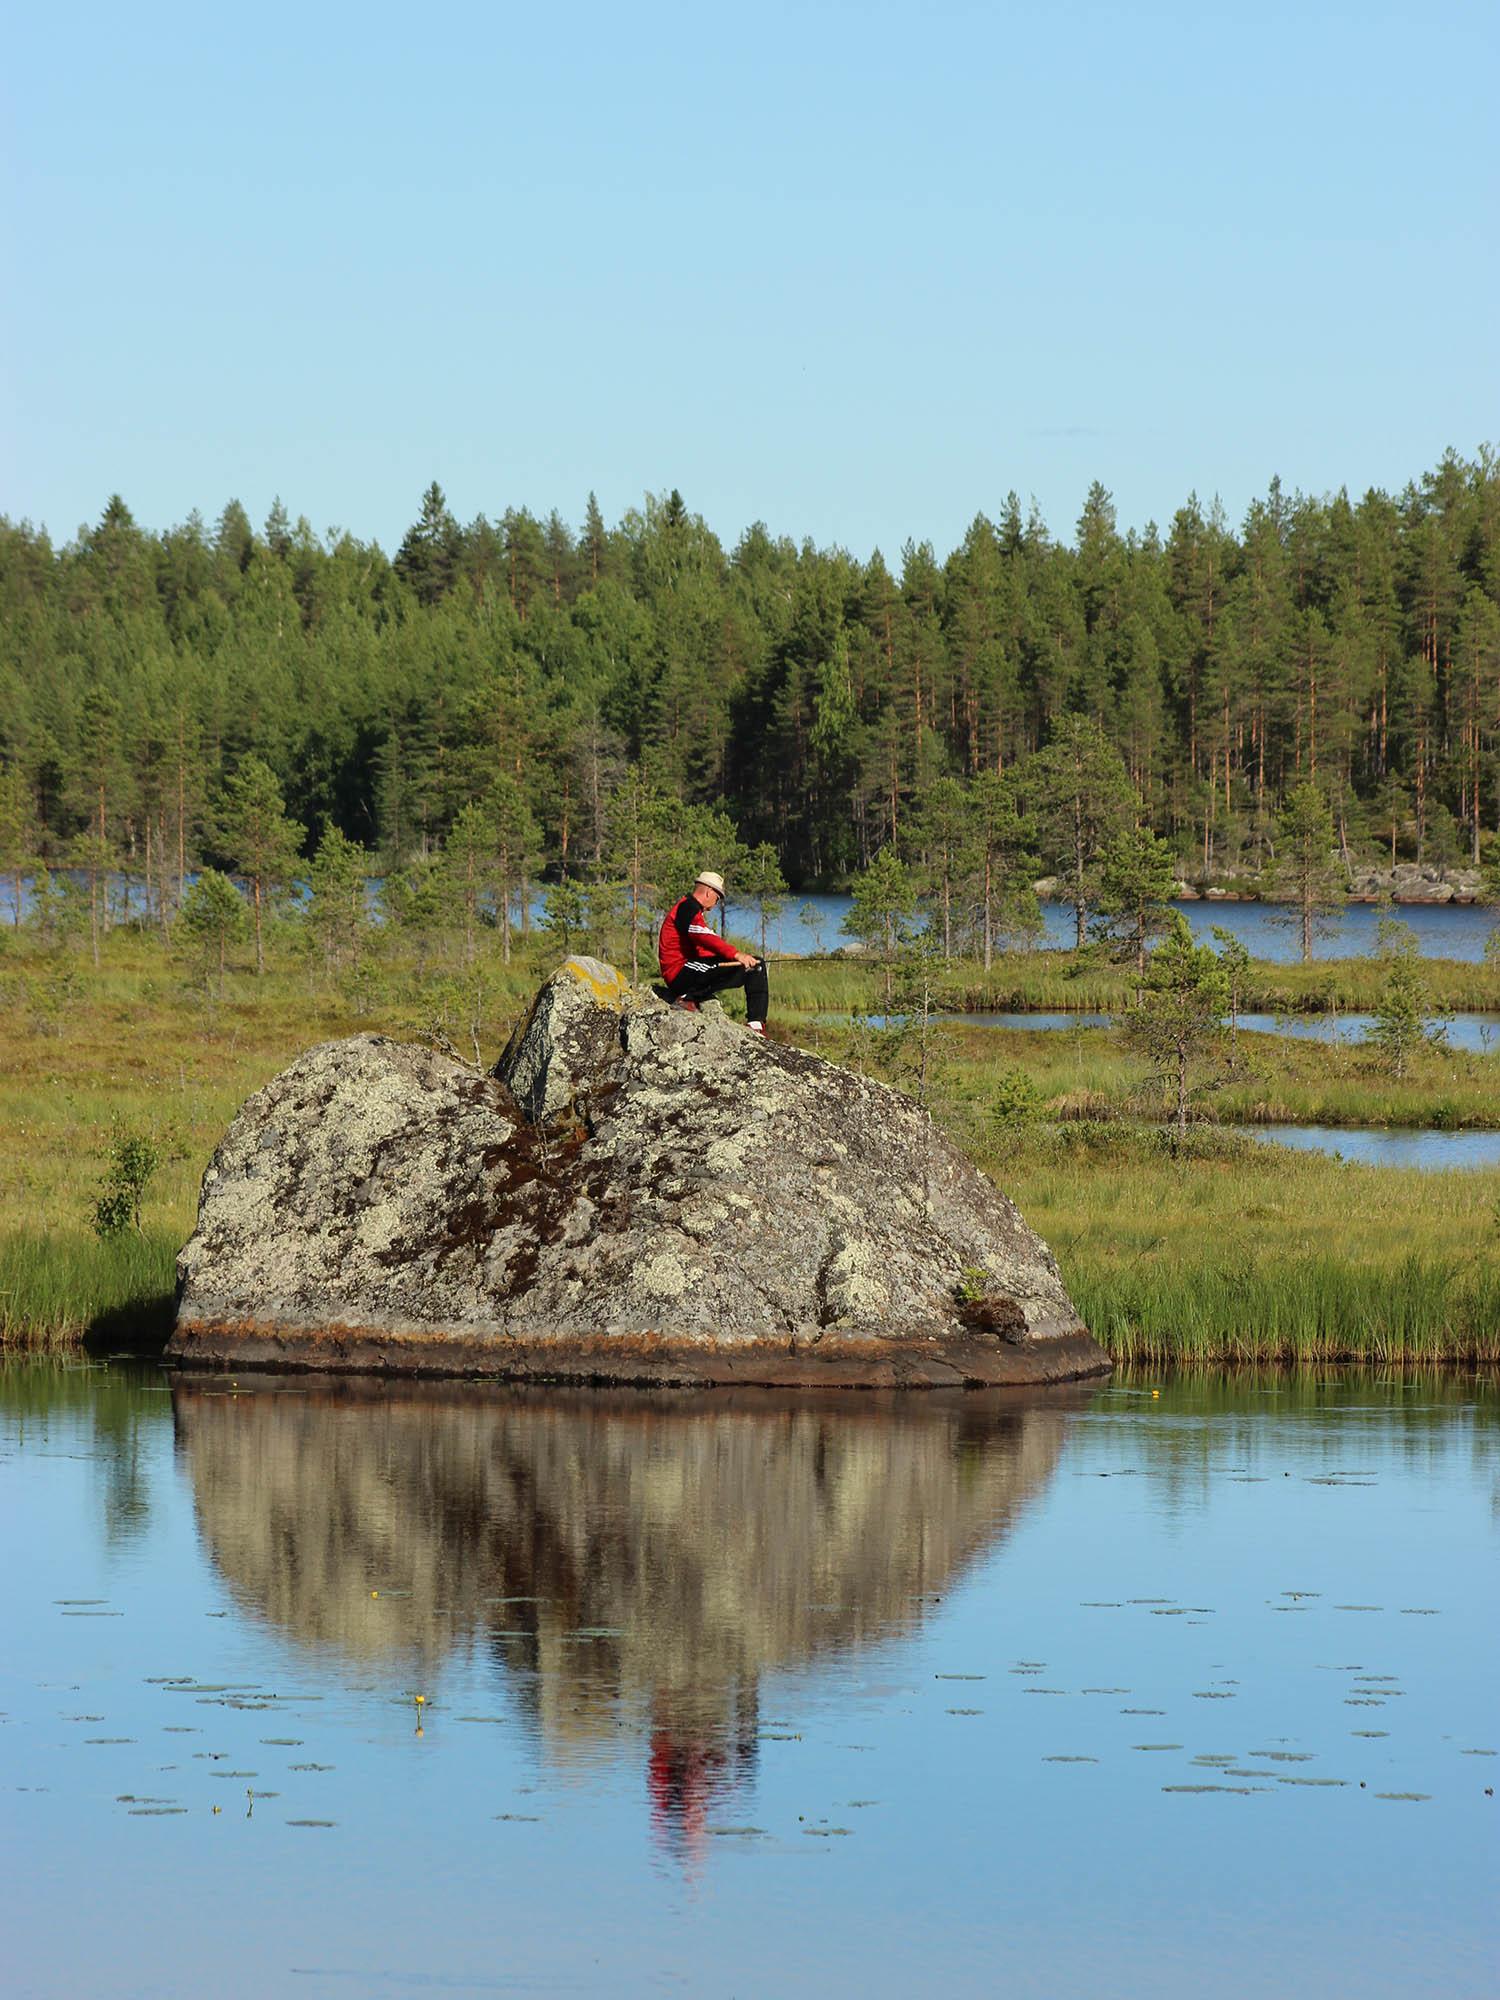 visitlestijarvi.fi has been published!